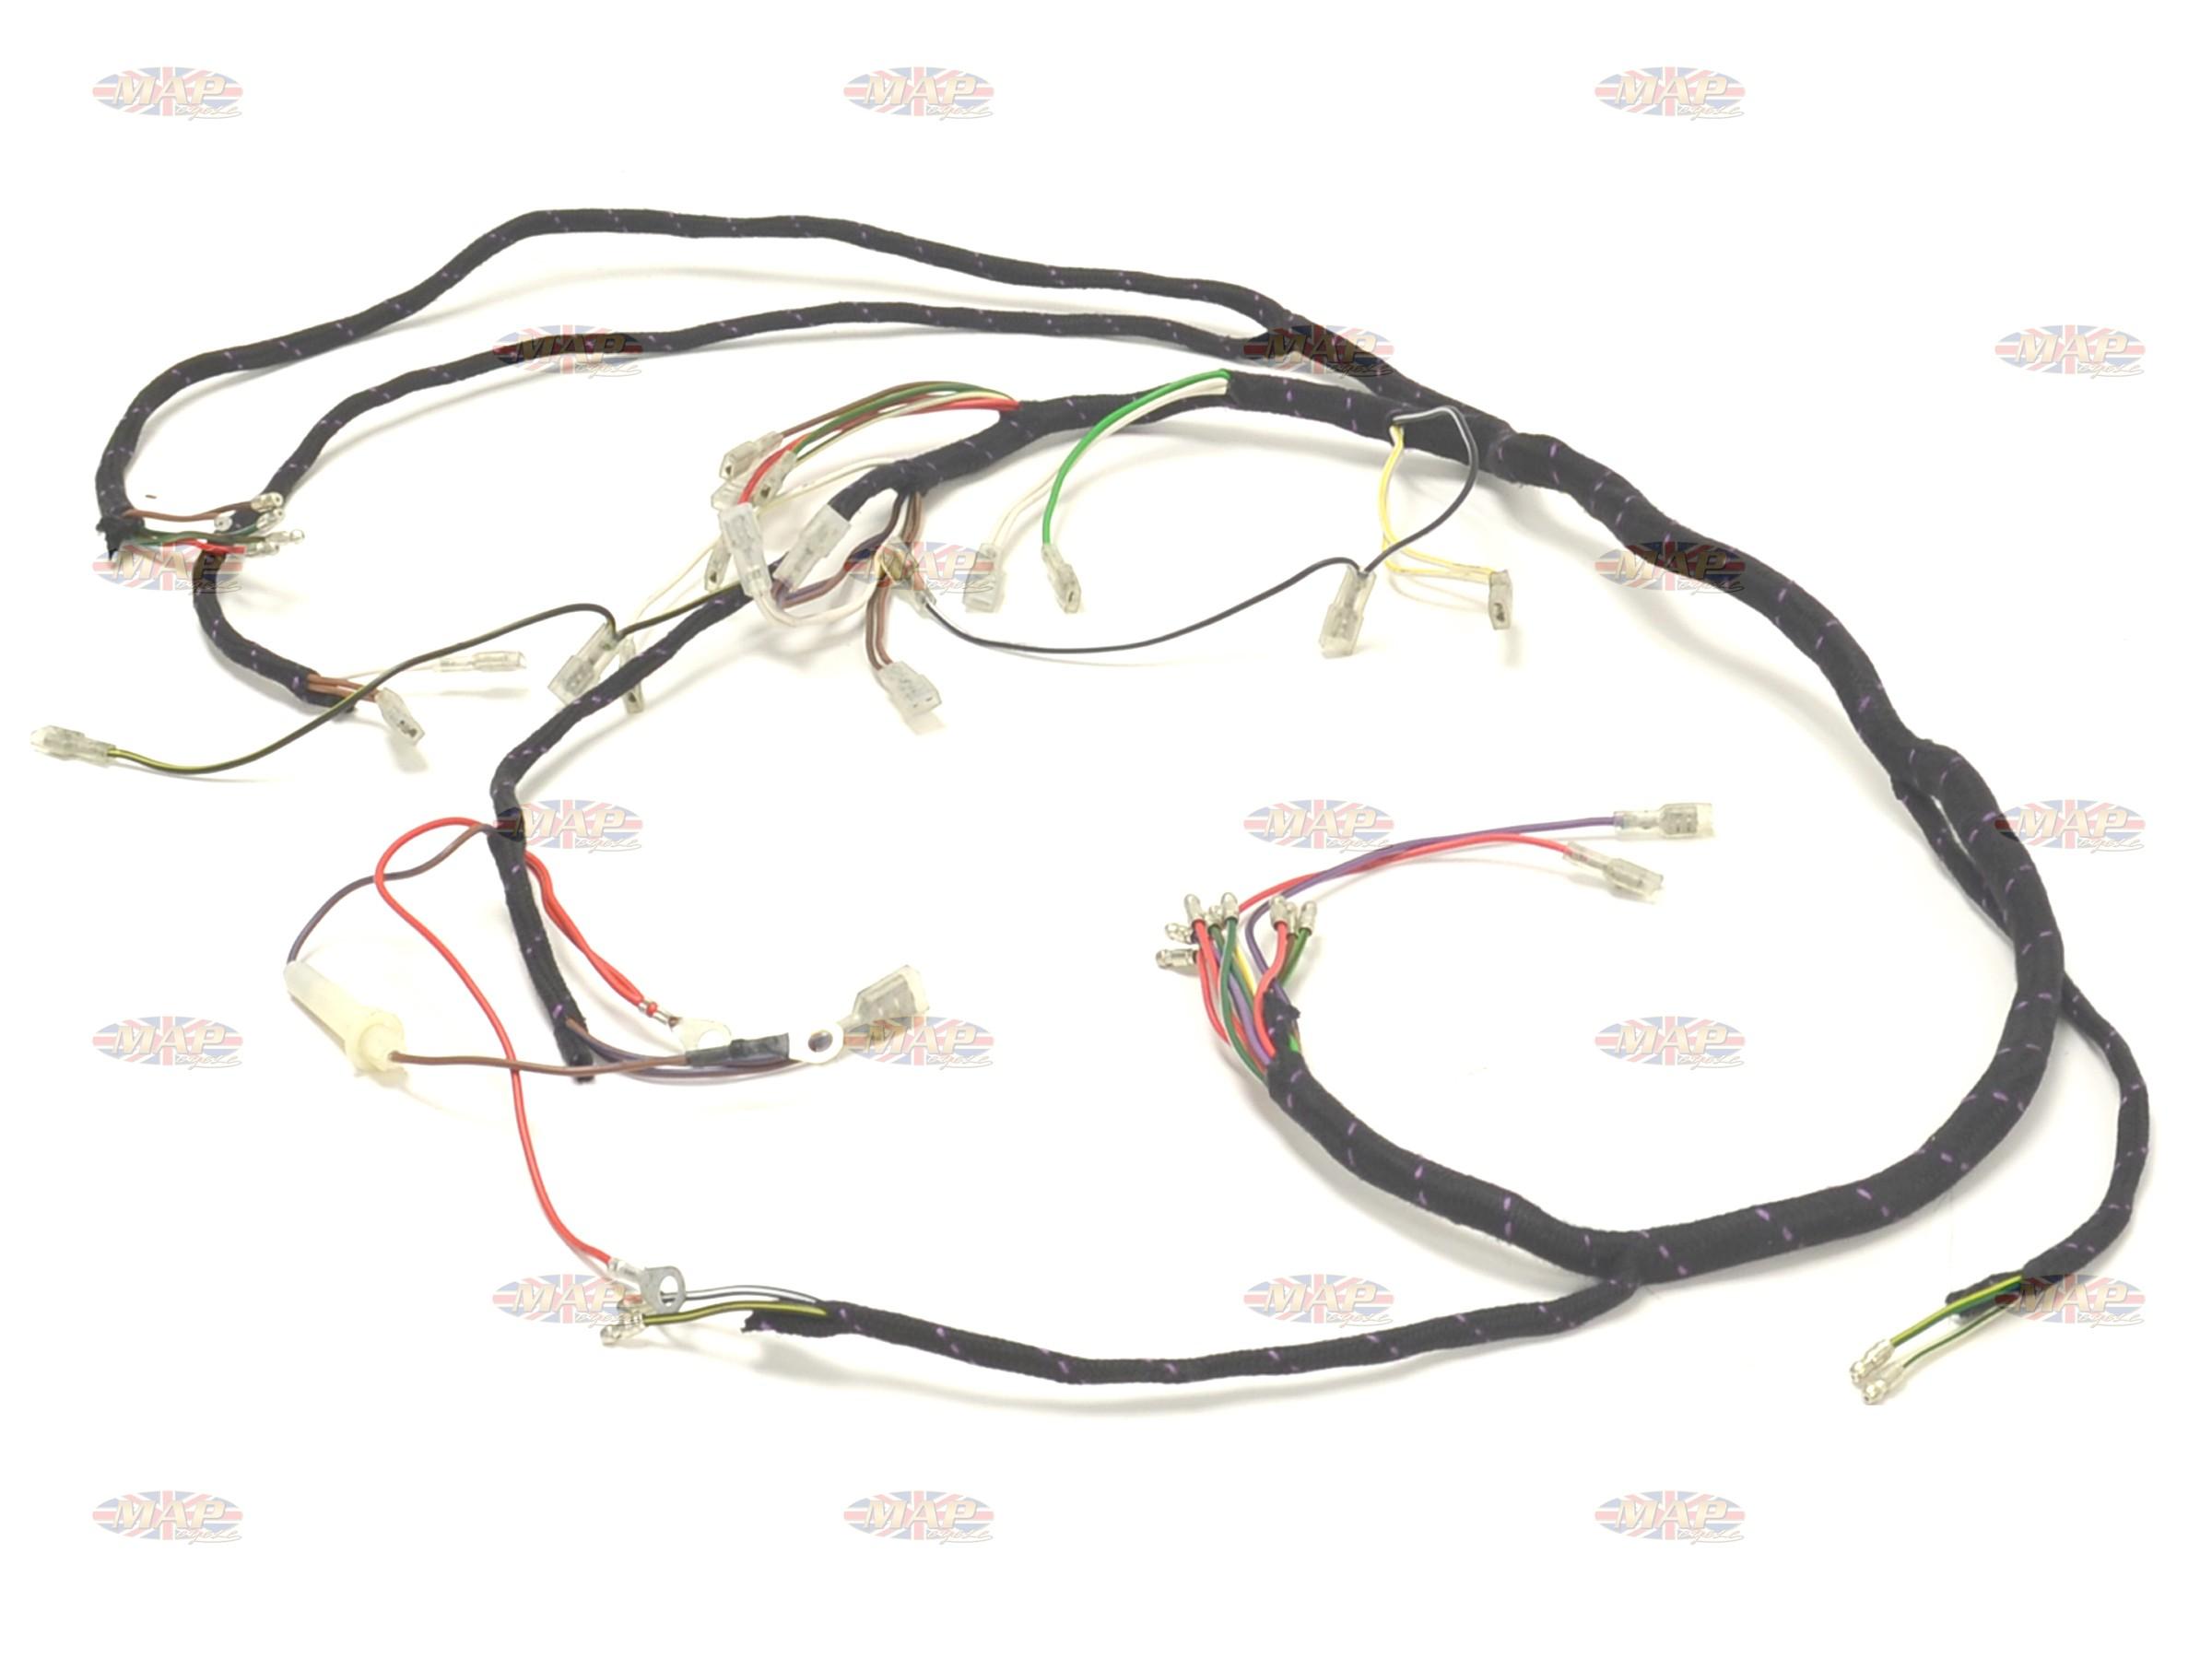 1971 triumph bonneville wiring diagram 1962 chevy k10 73 t120 tr6 tiger uk made main